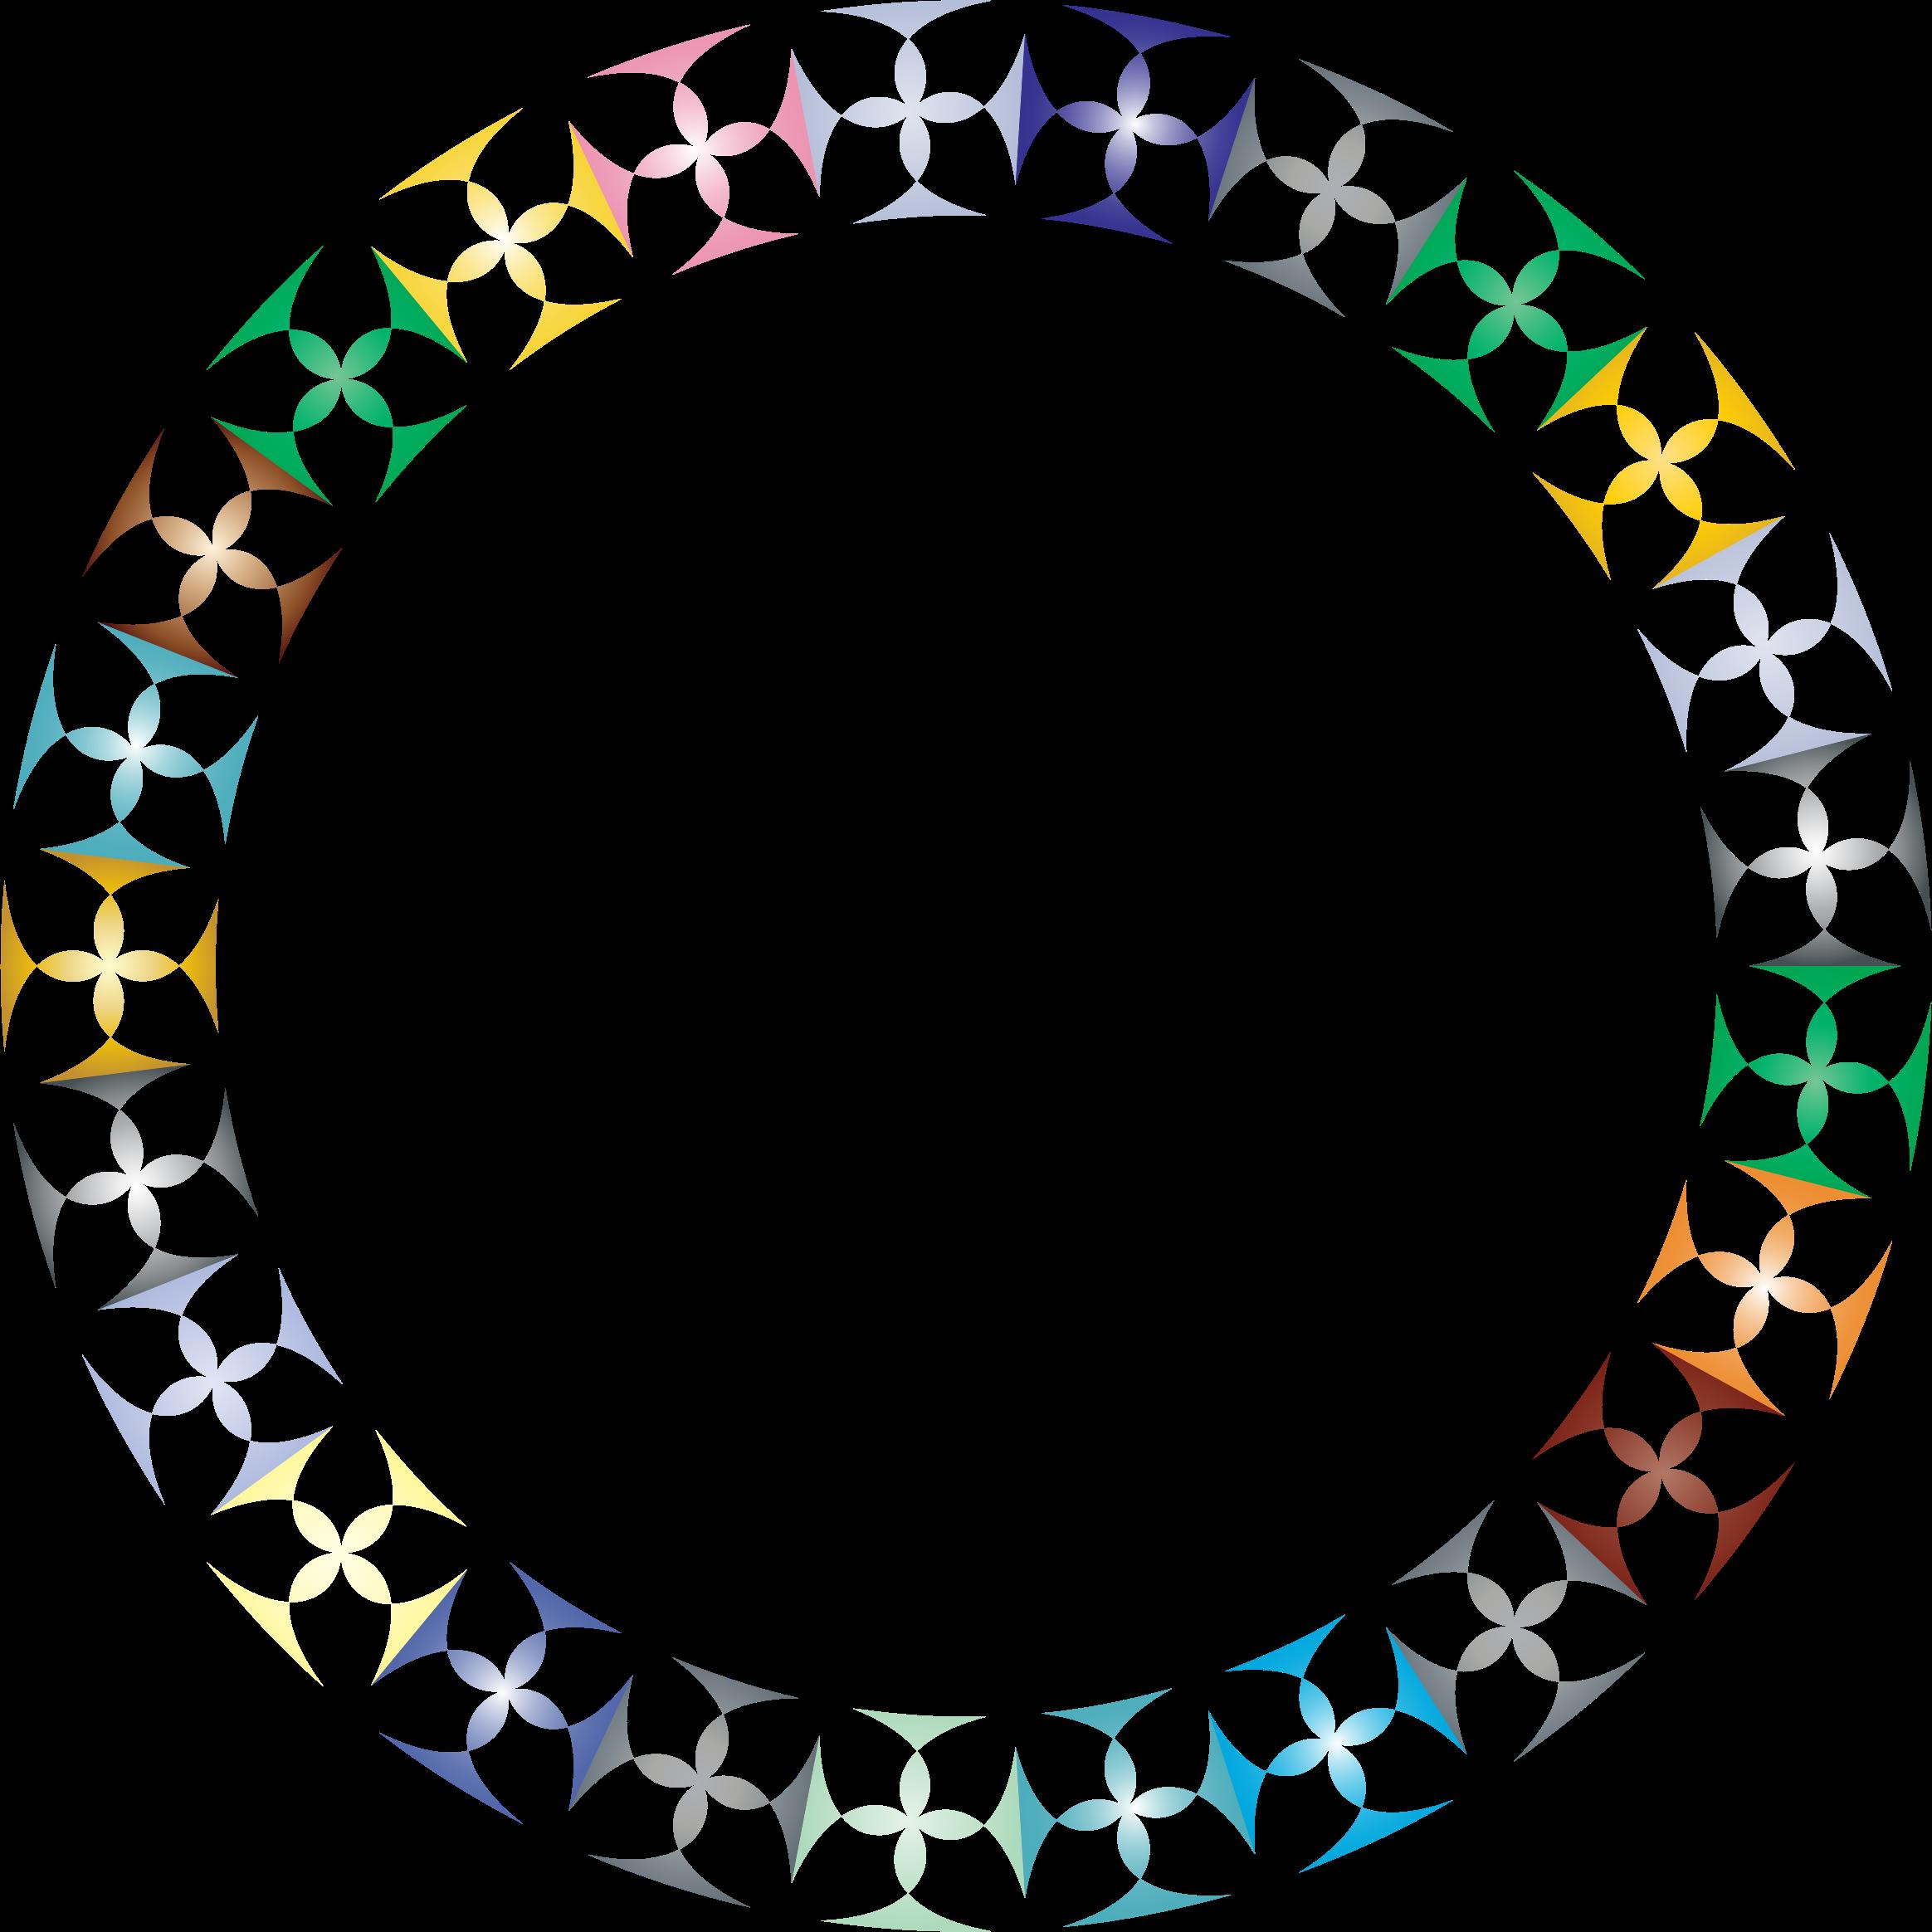 Diamonds clipart rainbow. Prismatic clover circle big